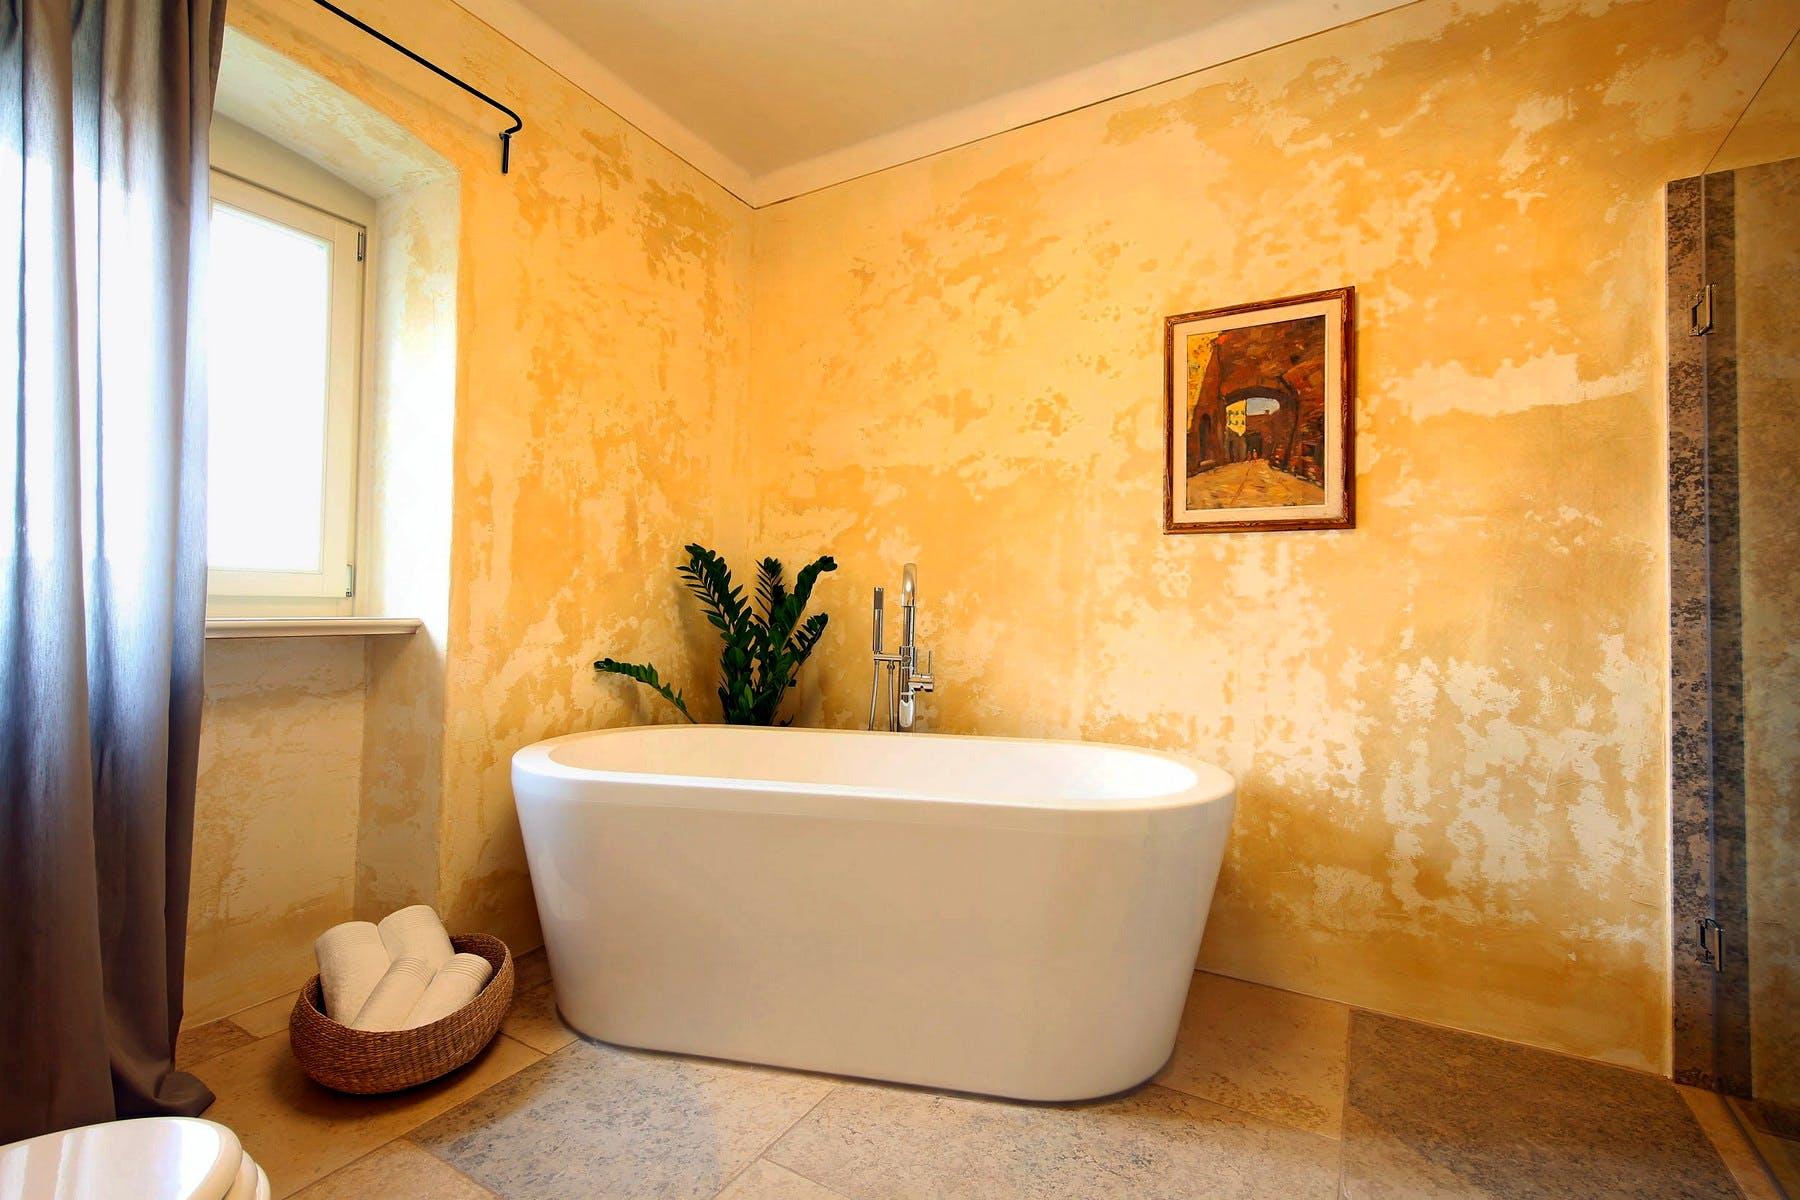 Bathroom design with luxurious bathtub